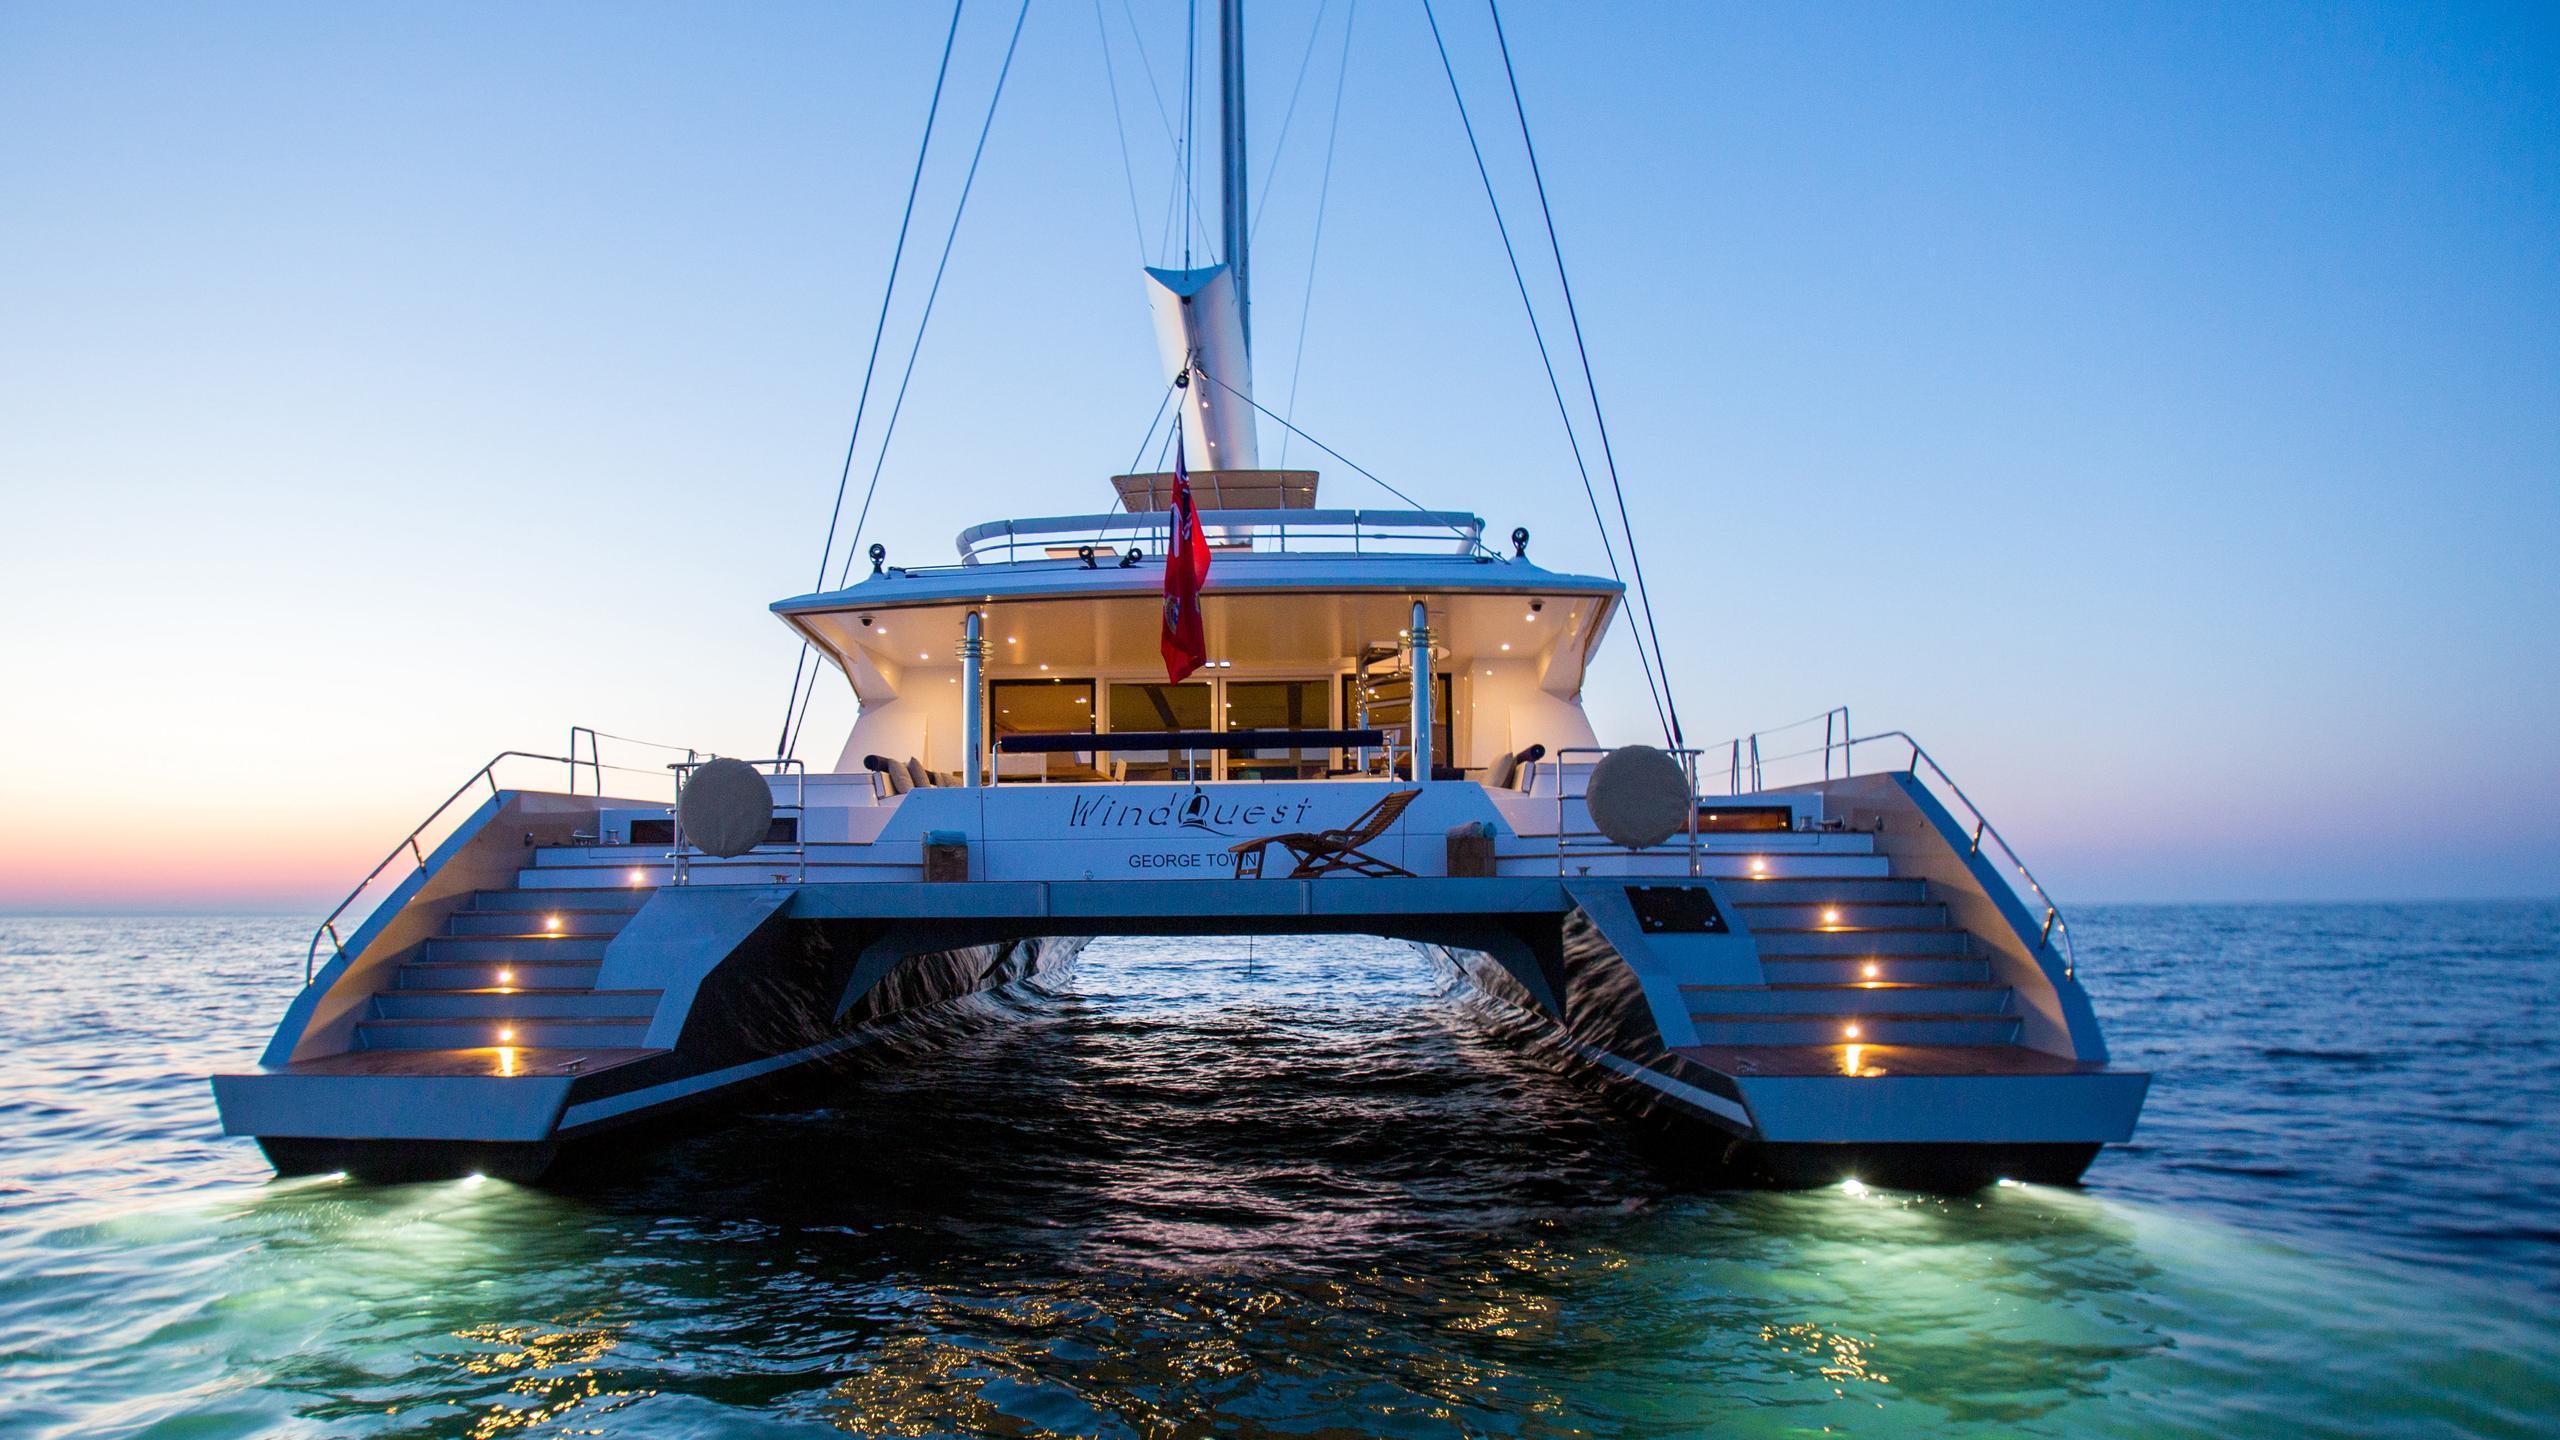 Windquest-catamaran-yacht-jfa-2014-26m-stern